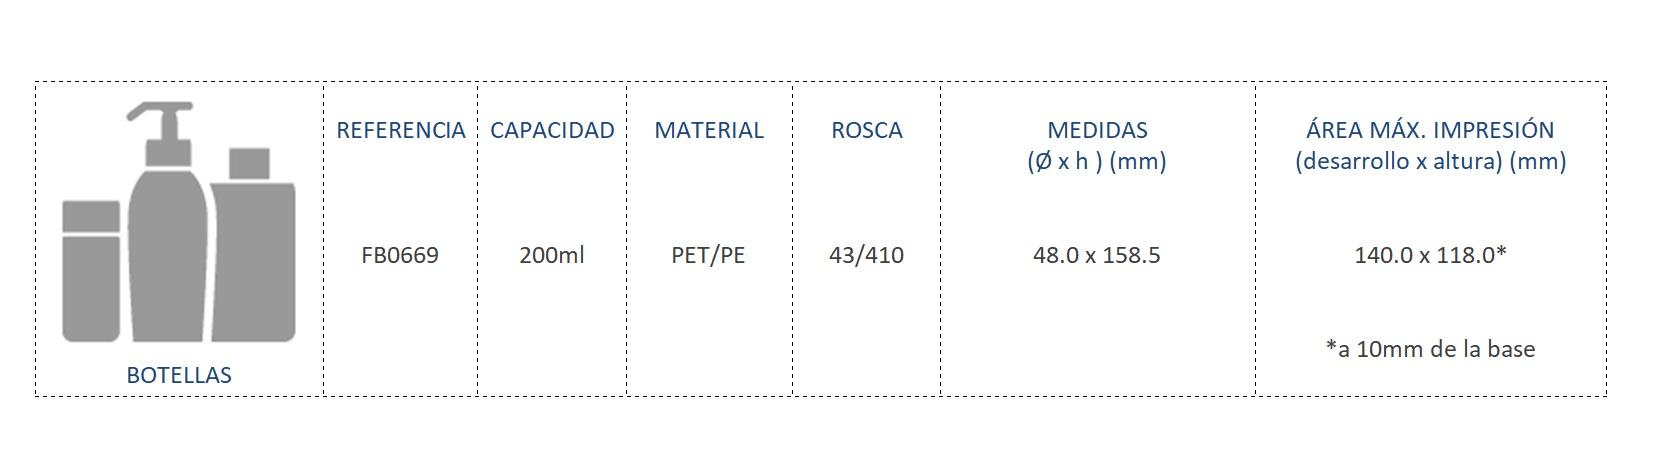 Cuadro de materiales botella FB0669